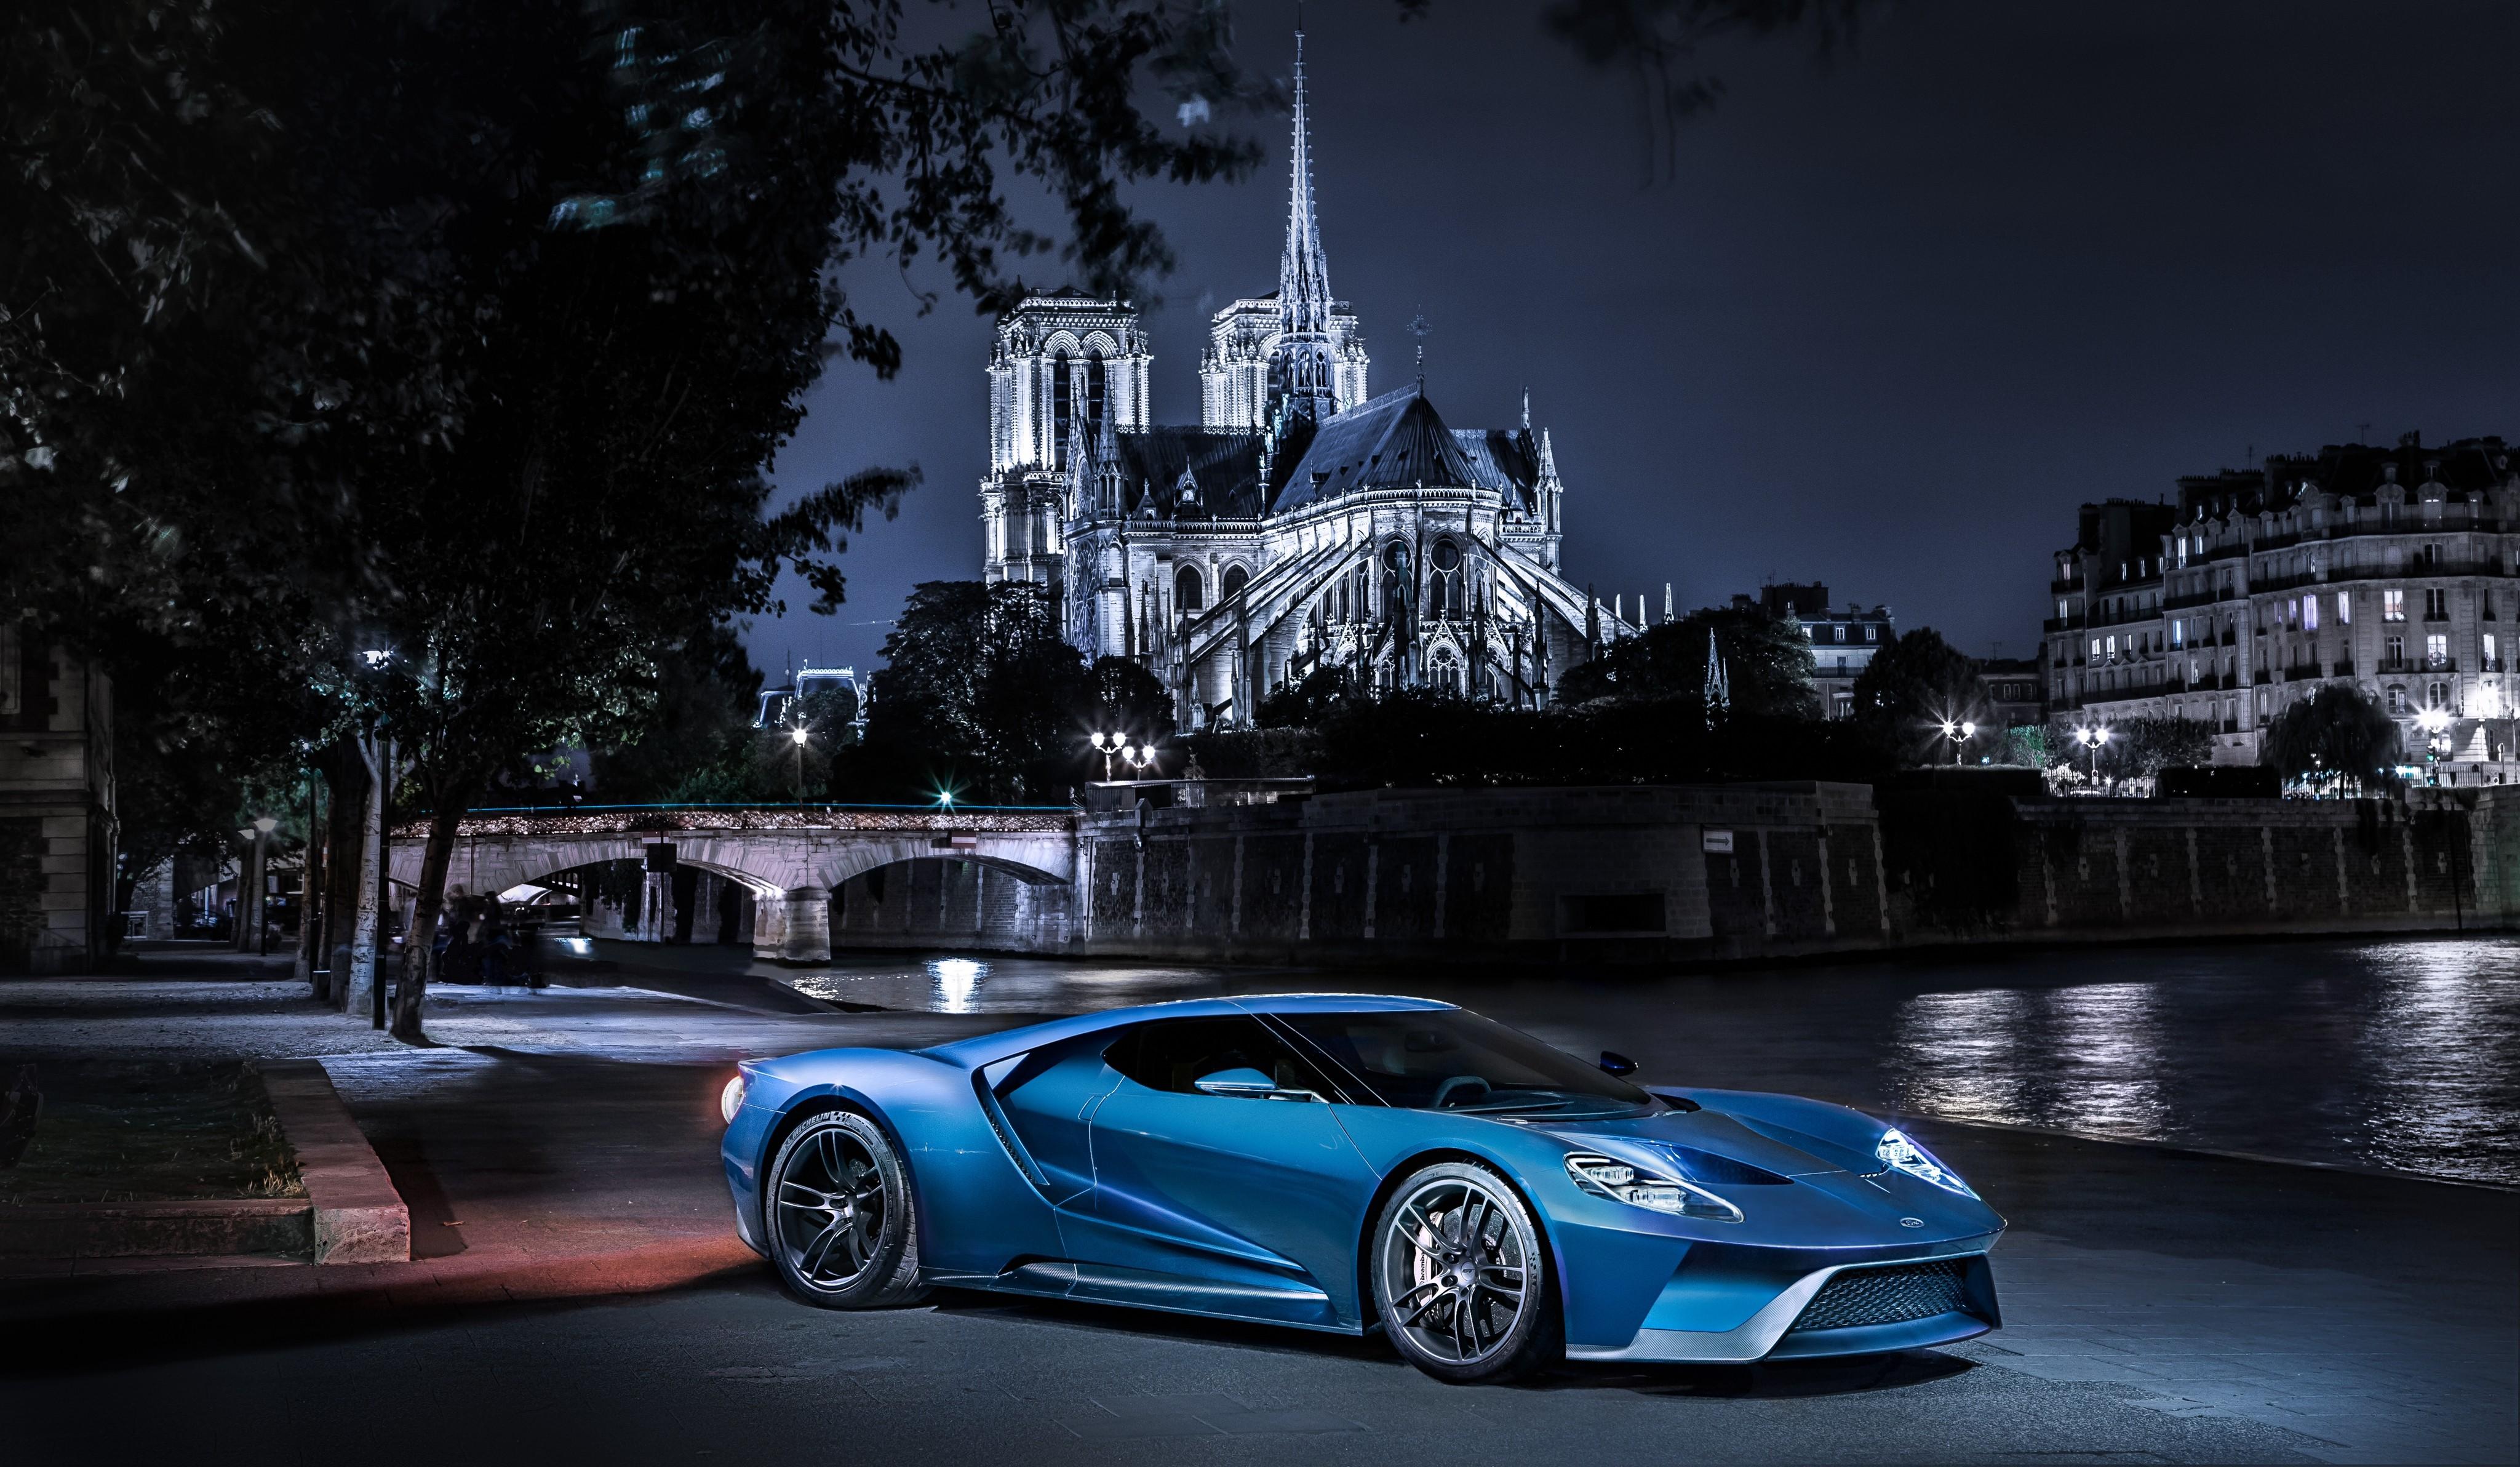 wallpaper ford gt supercar concept blue sports car luxury cars test drive cars bikes 8040. Black Bedroom Furniture Sets. Home Design Ideas